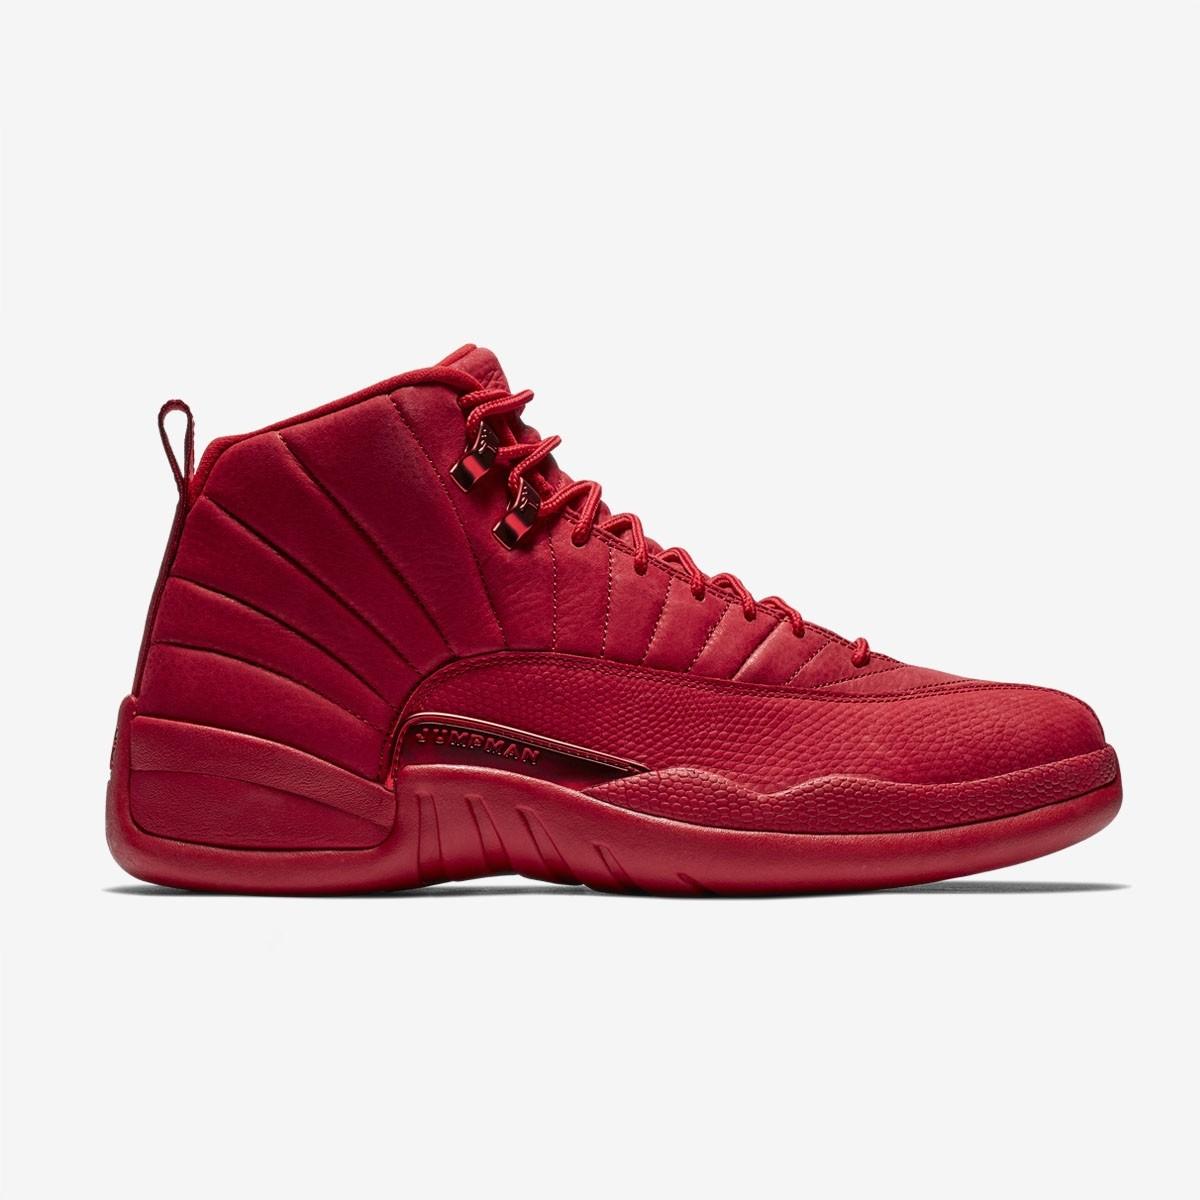 Air Jordan 12 'Gym Red'